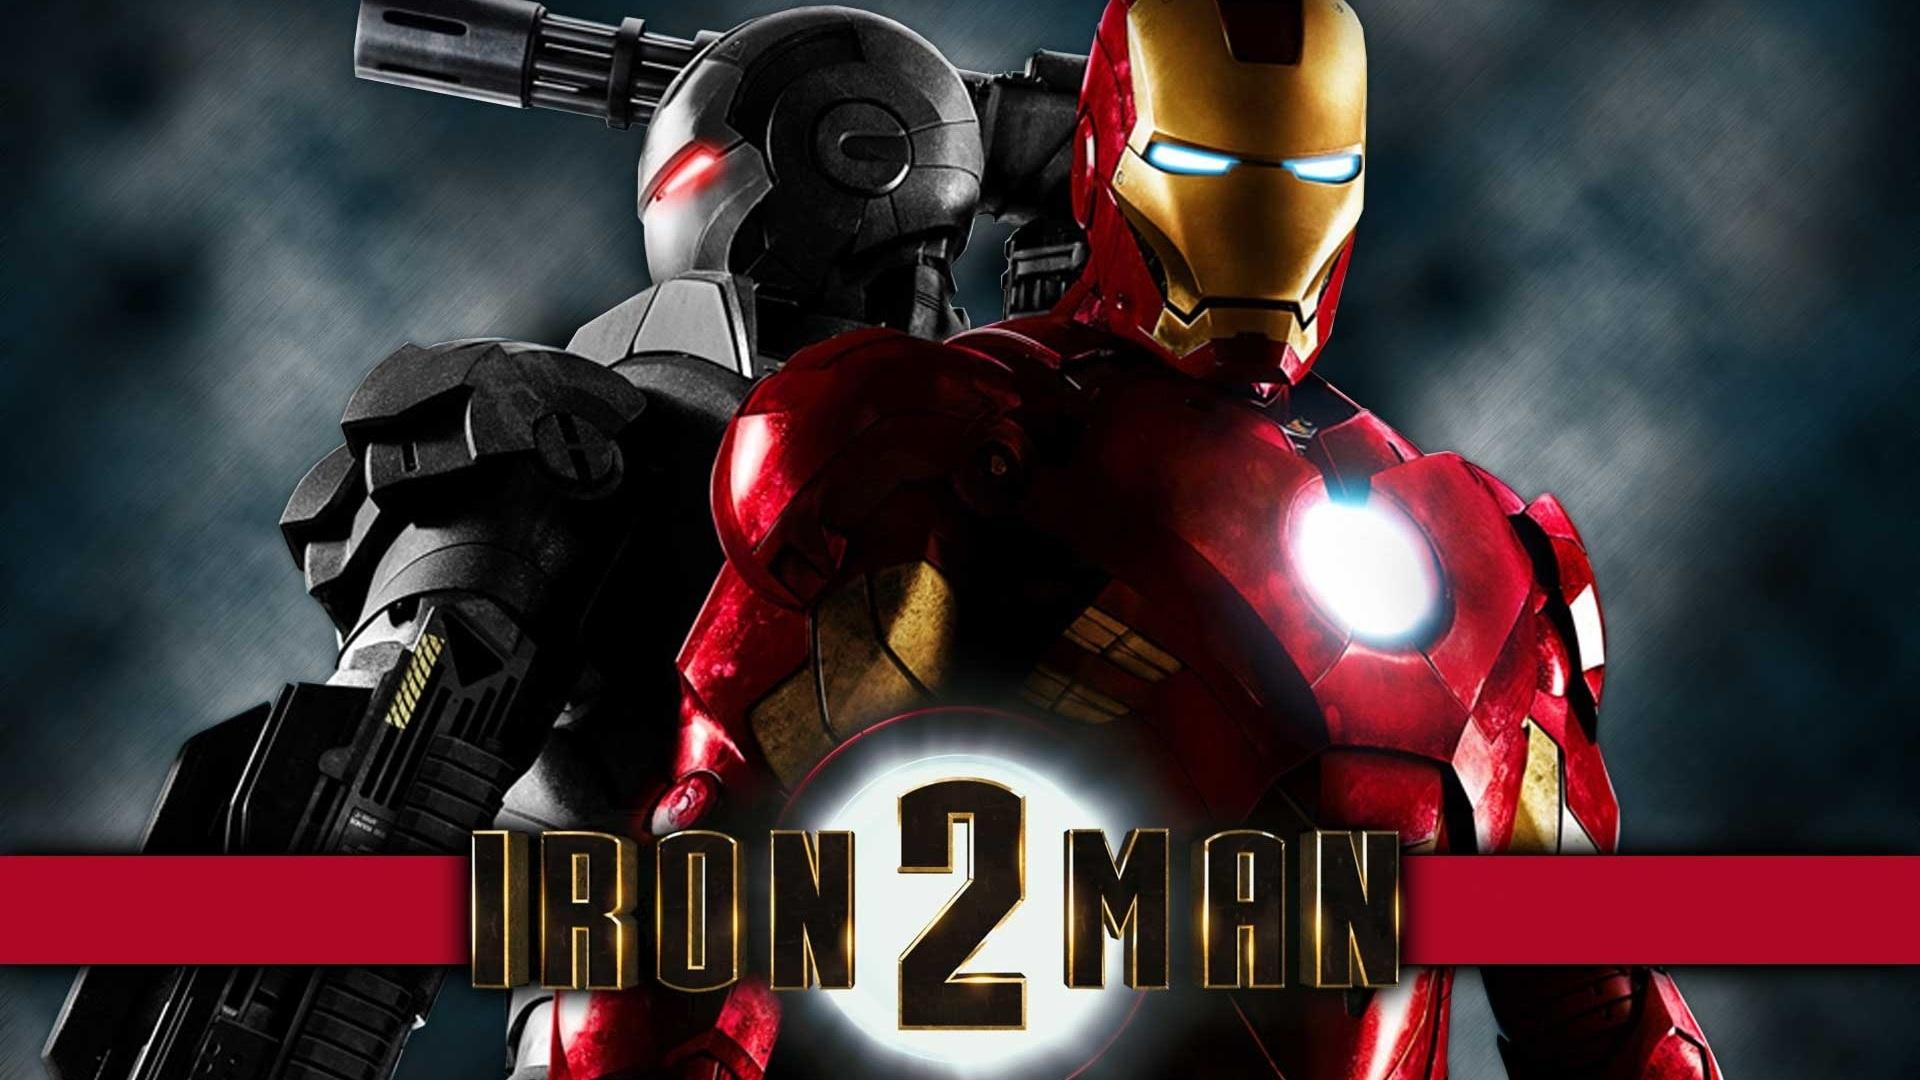 Iron Man Wallpaper 34447: 桌布 鋼鐵俠2 1920x1200 HD 高清桌布, 圖片, 照片